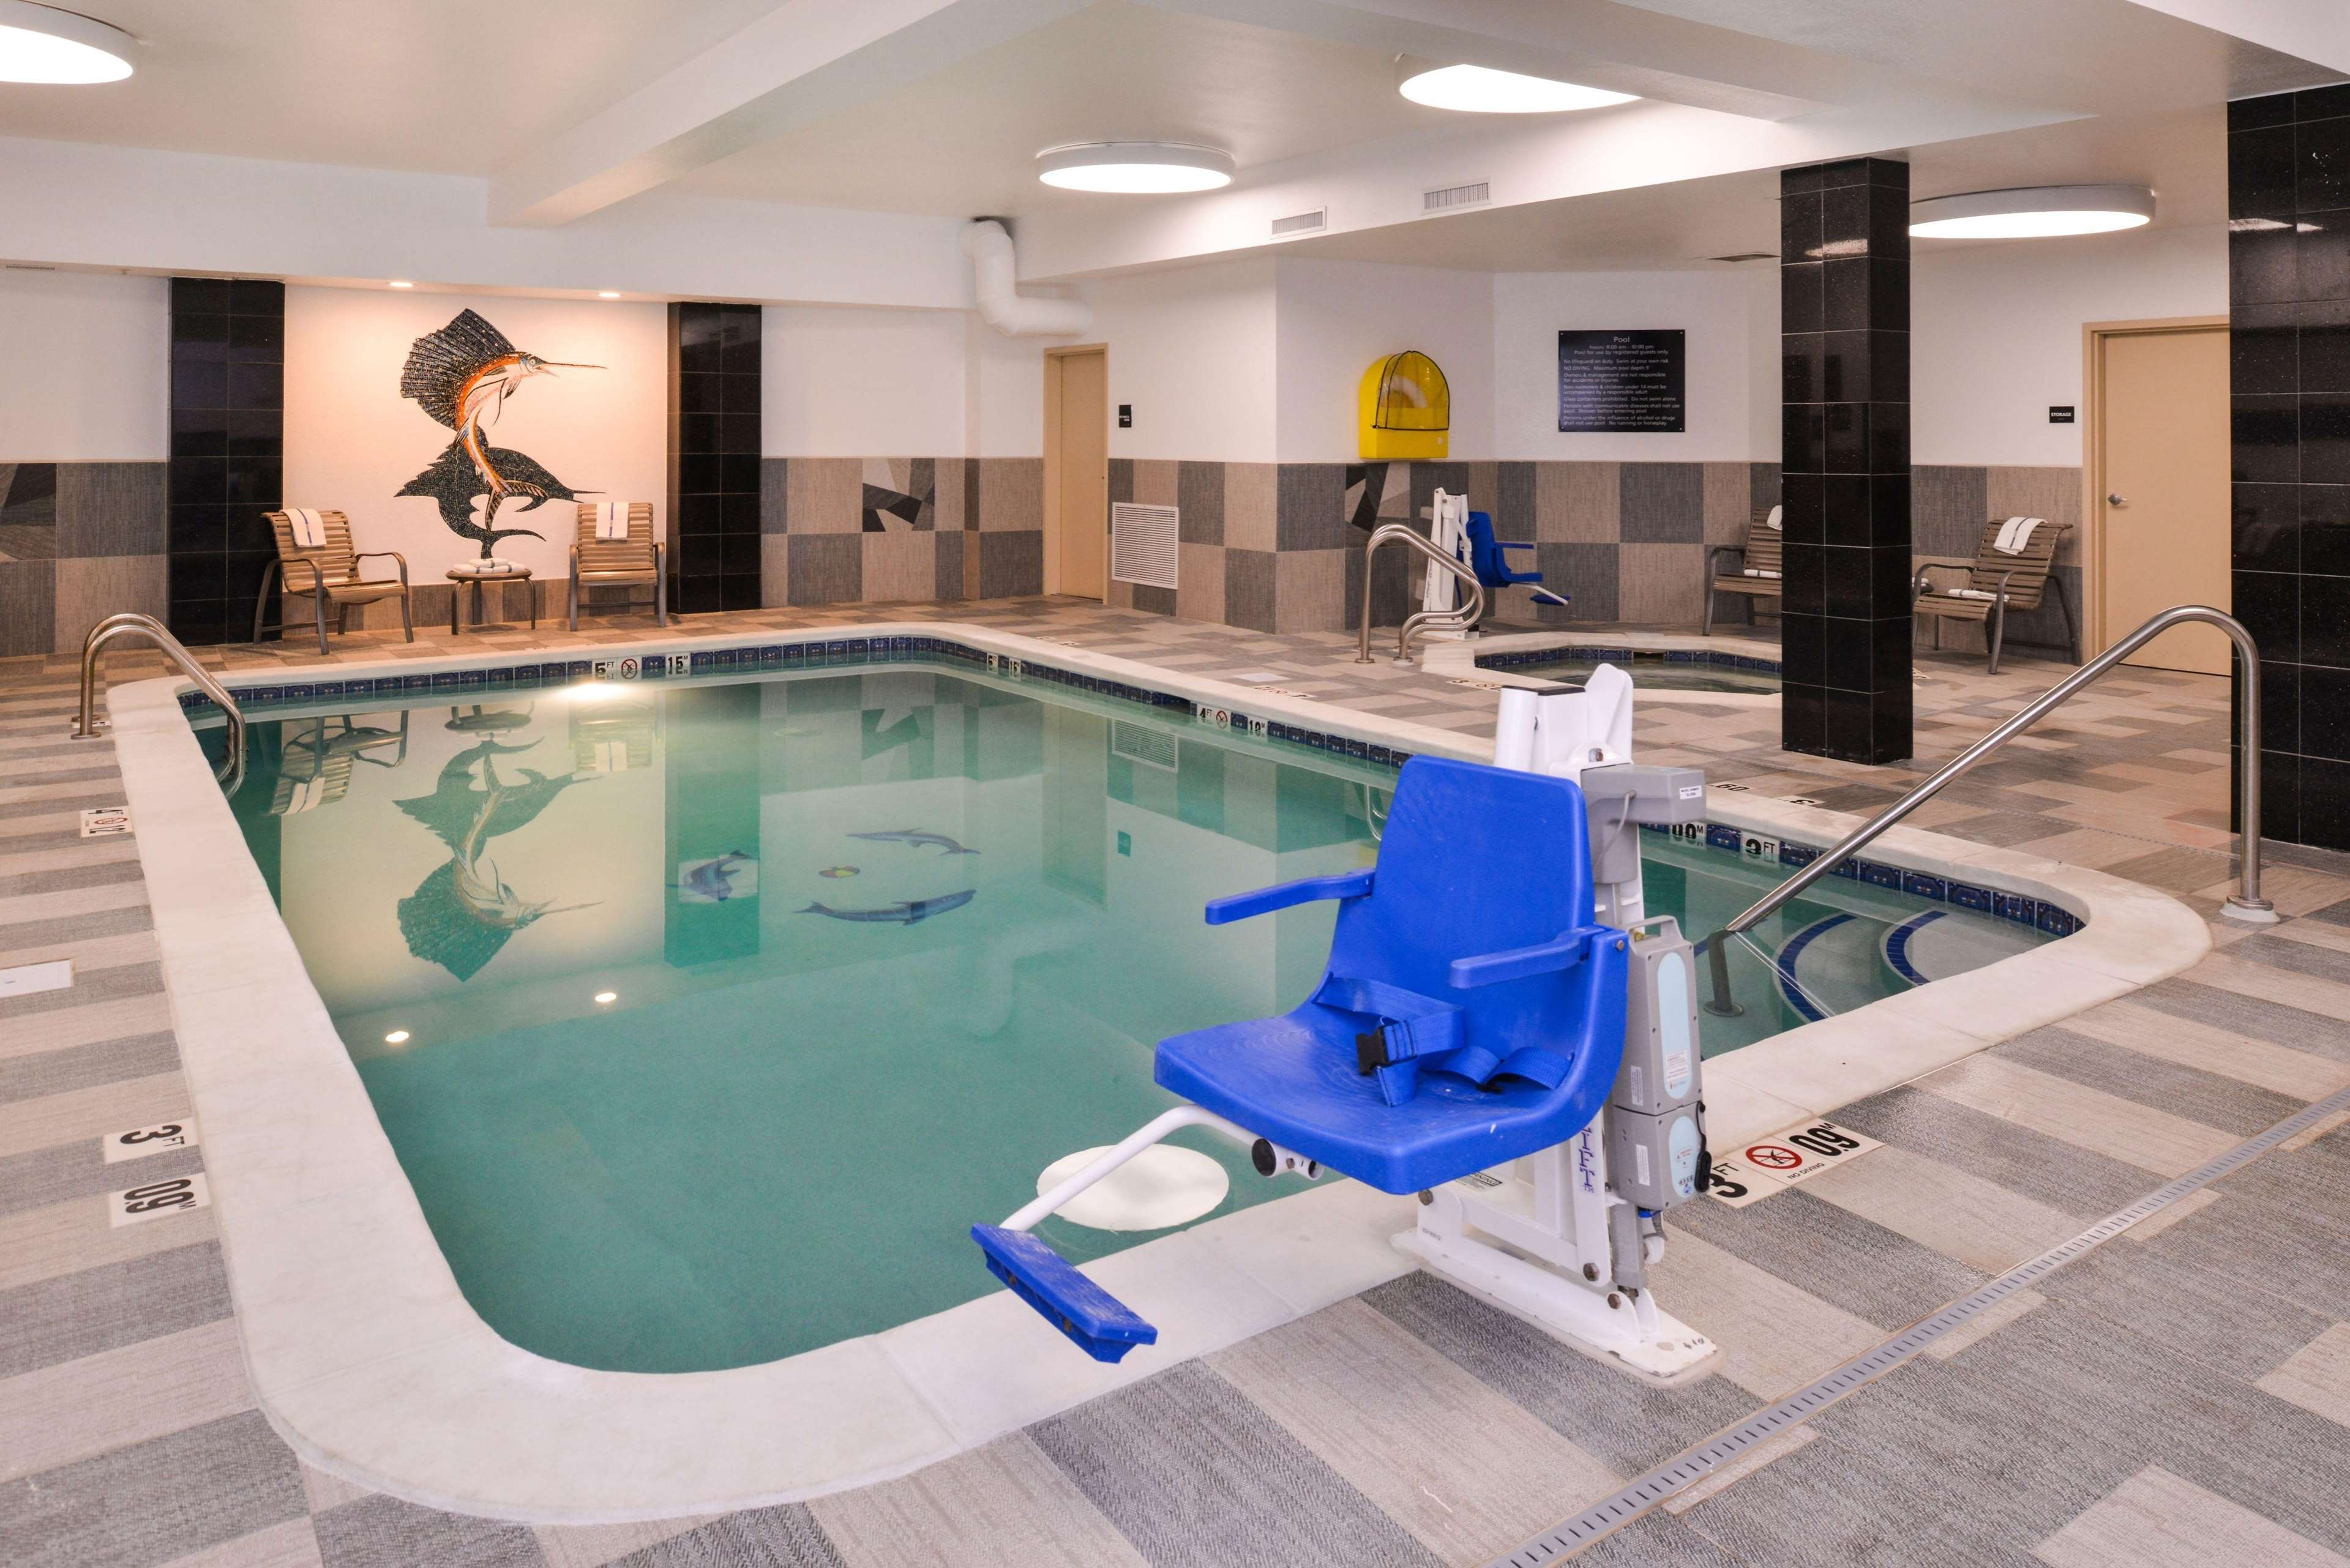 Hampton Inn & Suites Denver-Speer Boulevard image 0